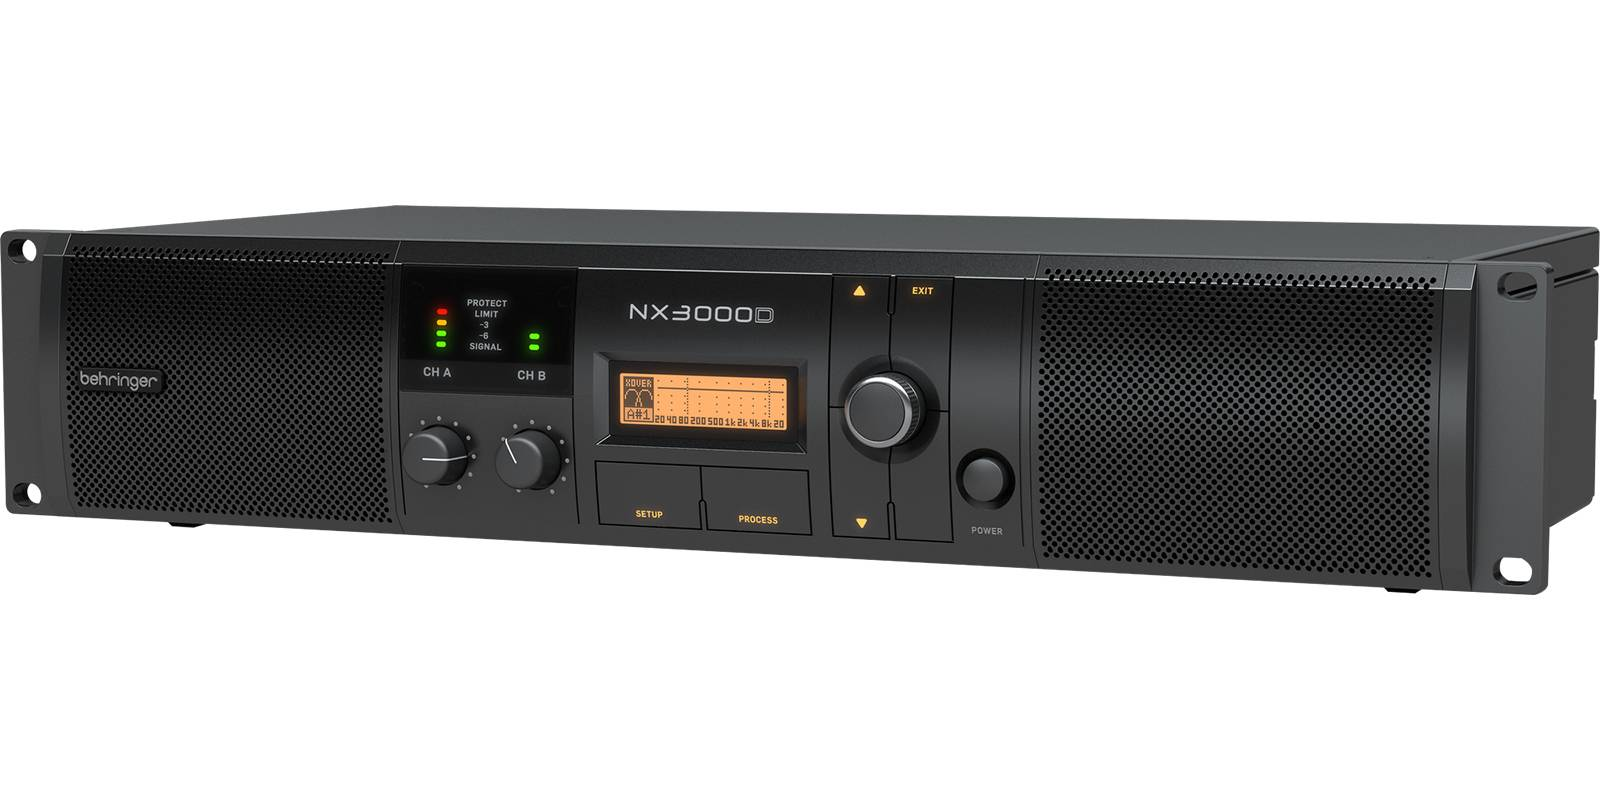 AMPLIFICADOR BEHRINGER PODER   NX3000D